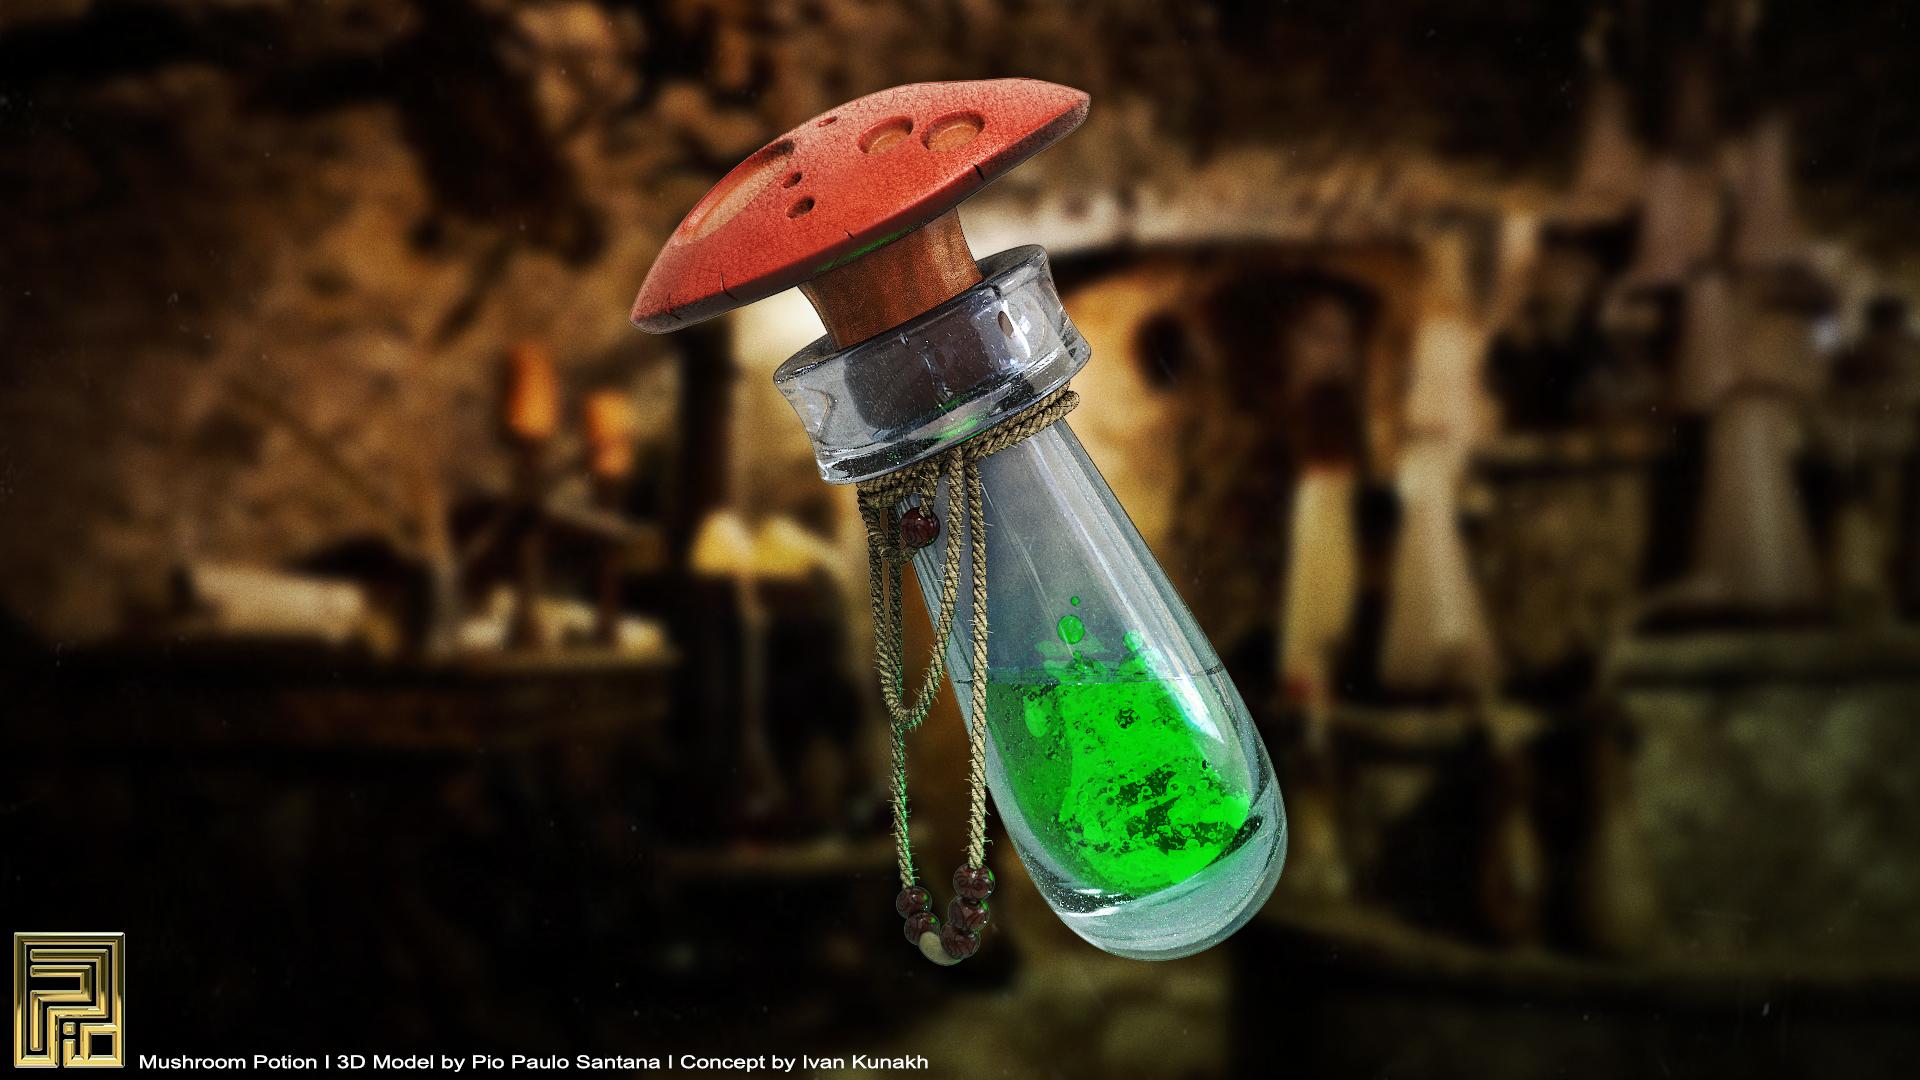 MushroomPotion_Color_001.5320.jpg